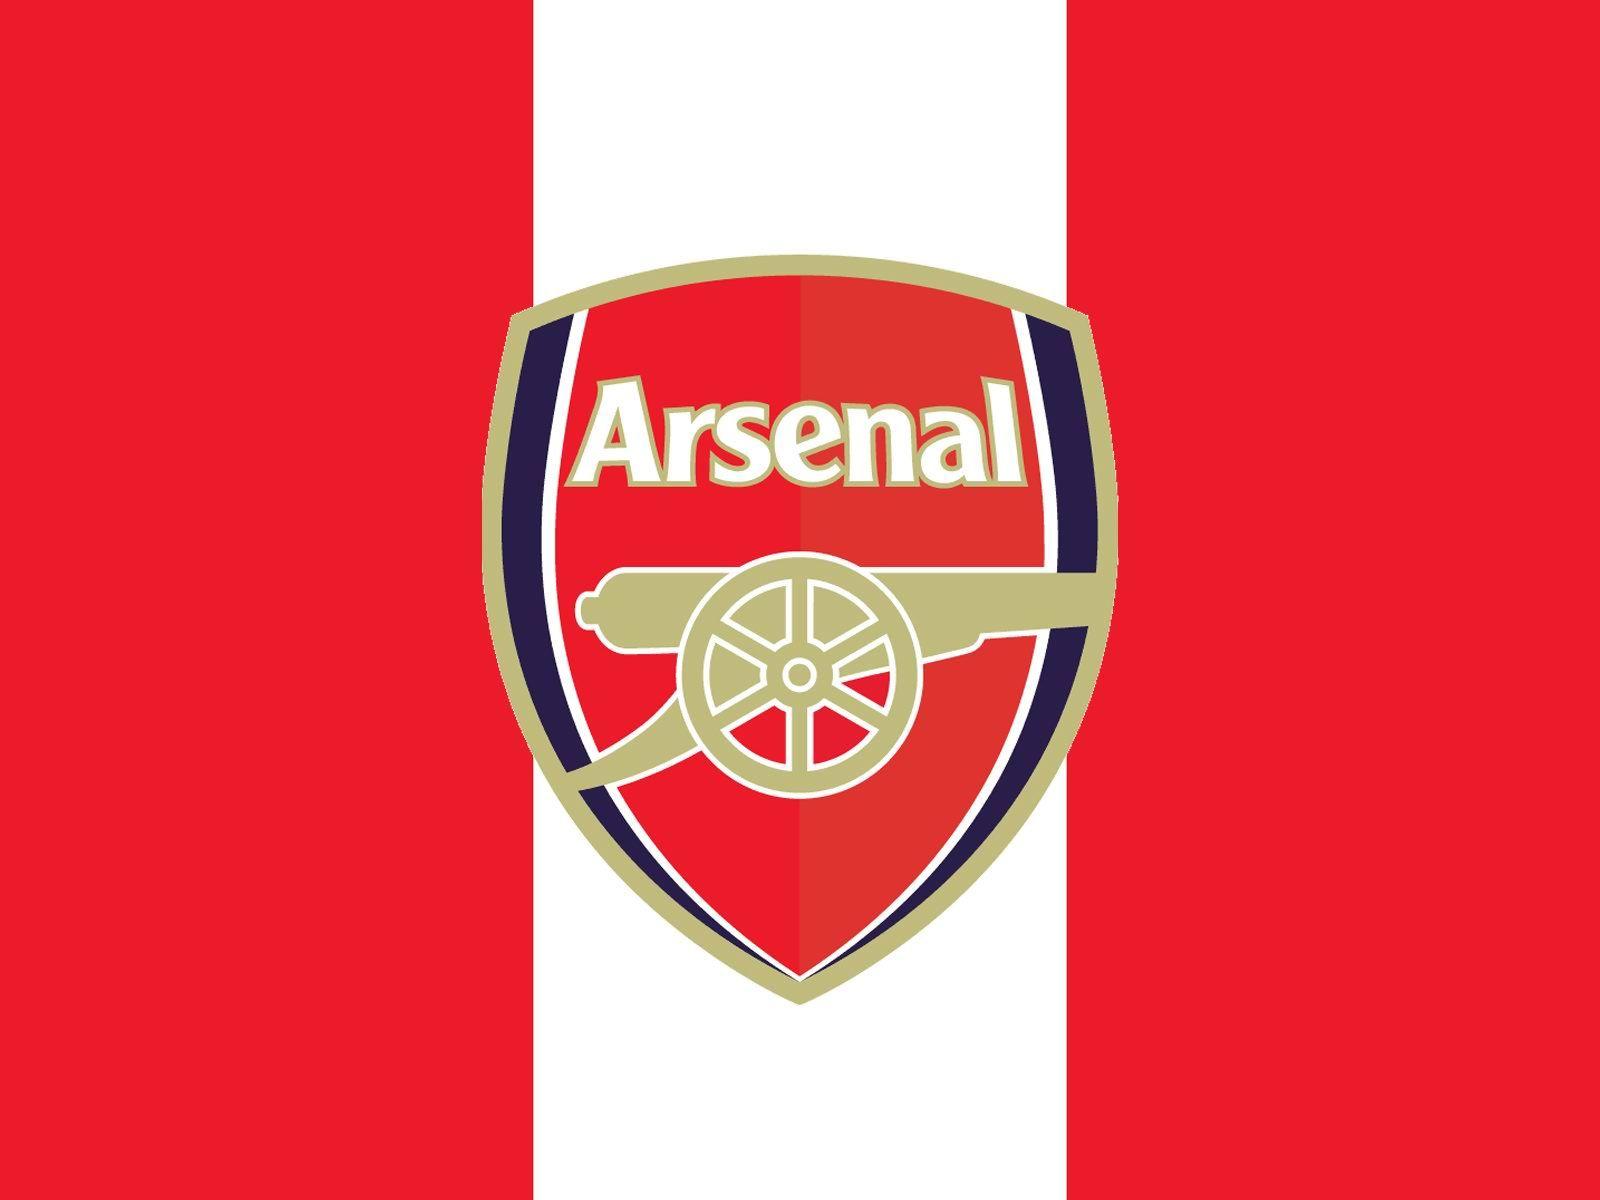 Wallpaper iphone arsenal - Arsenal Fc Wallpaper For Iphone Arsenal Fc Wallpapers Wallpapers